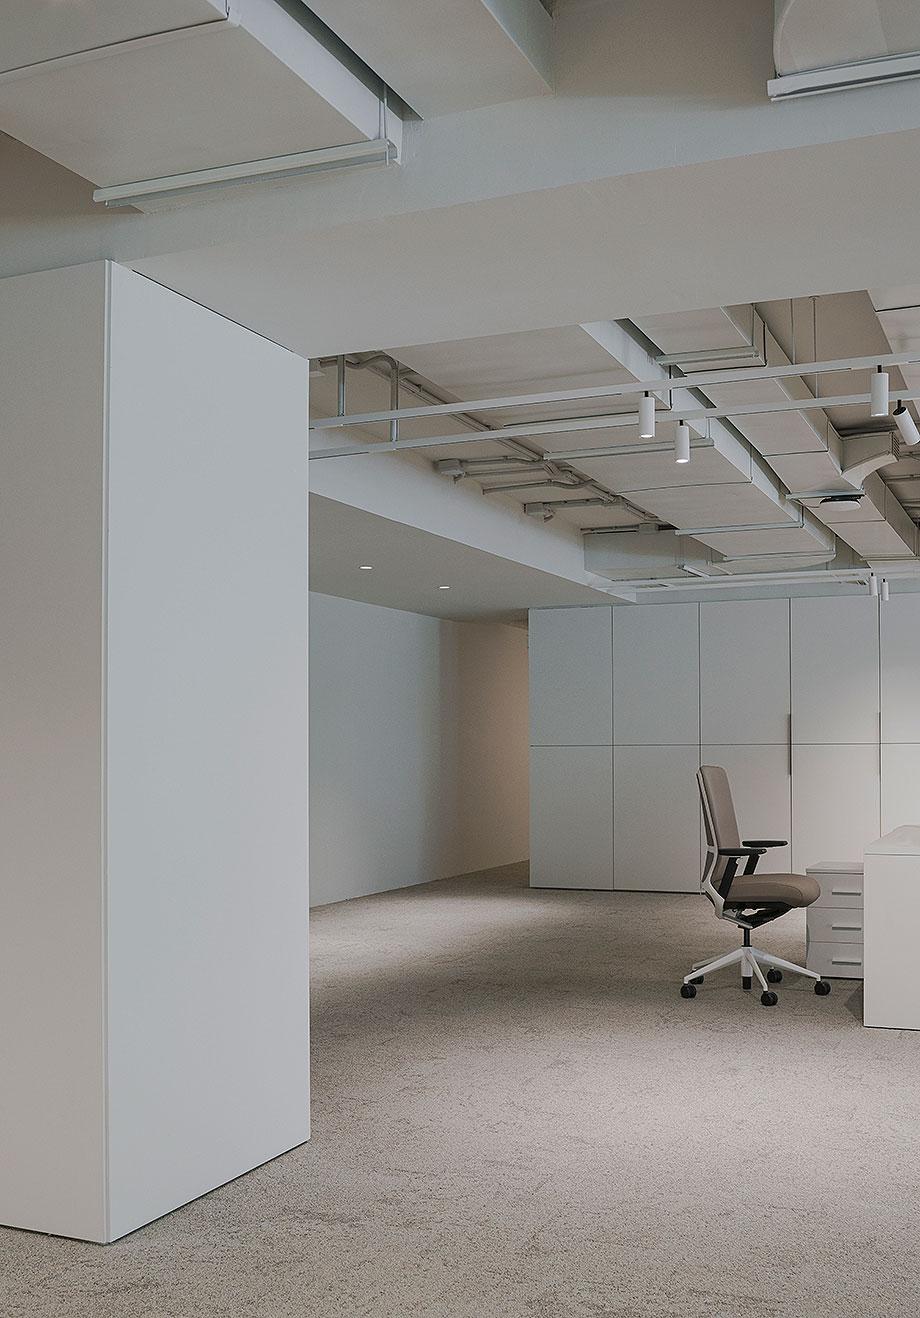 oficinas en madrid azora por francesc rife (9) - foto david zarzoso